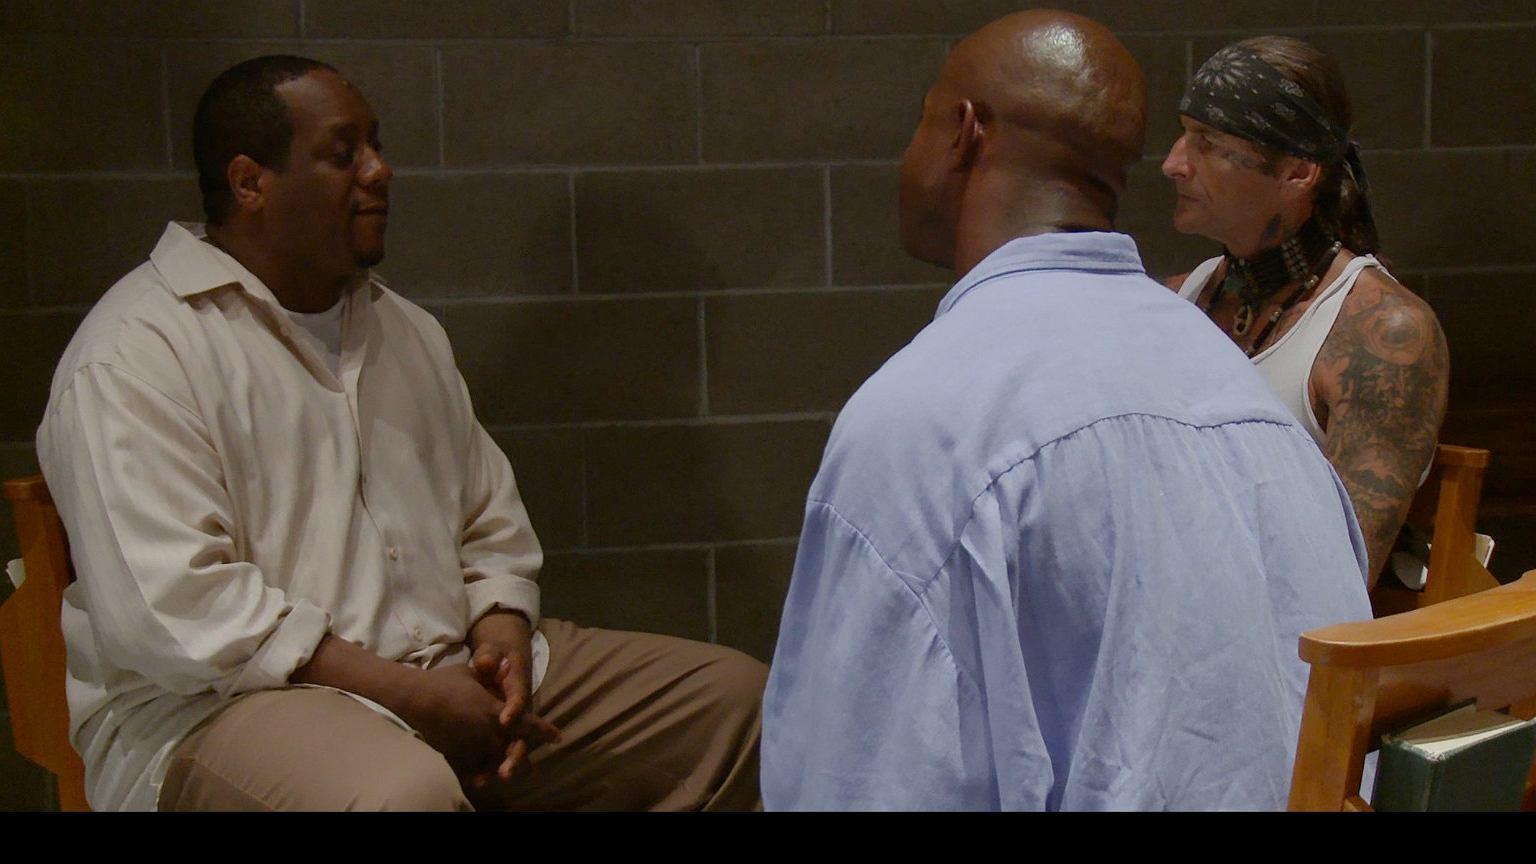 Kadr z filmu 'Praca'